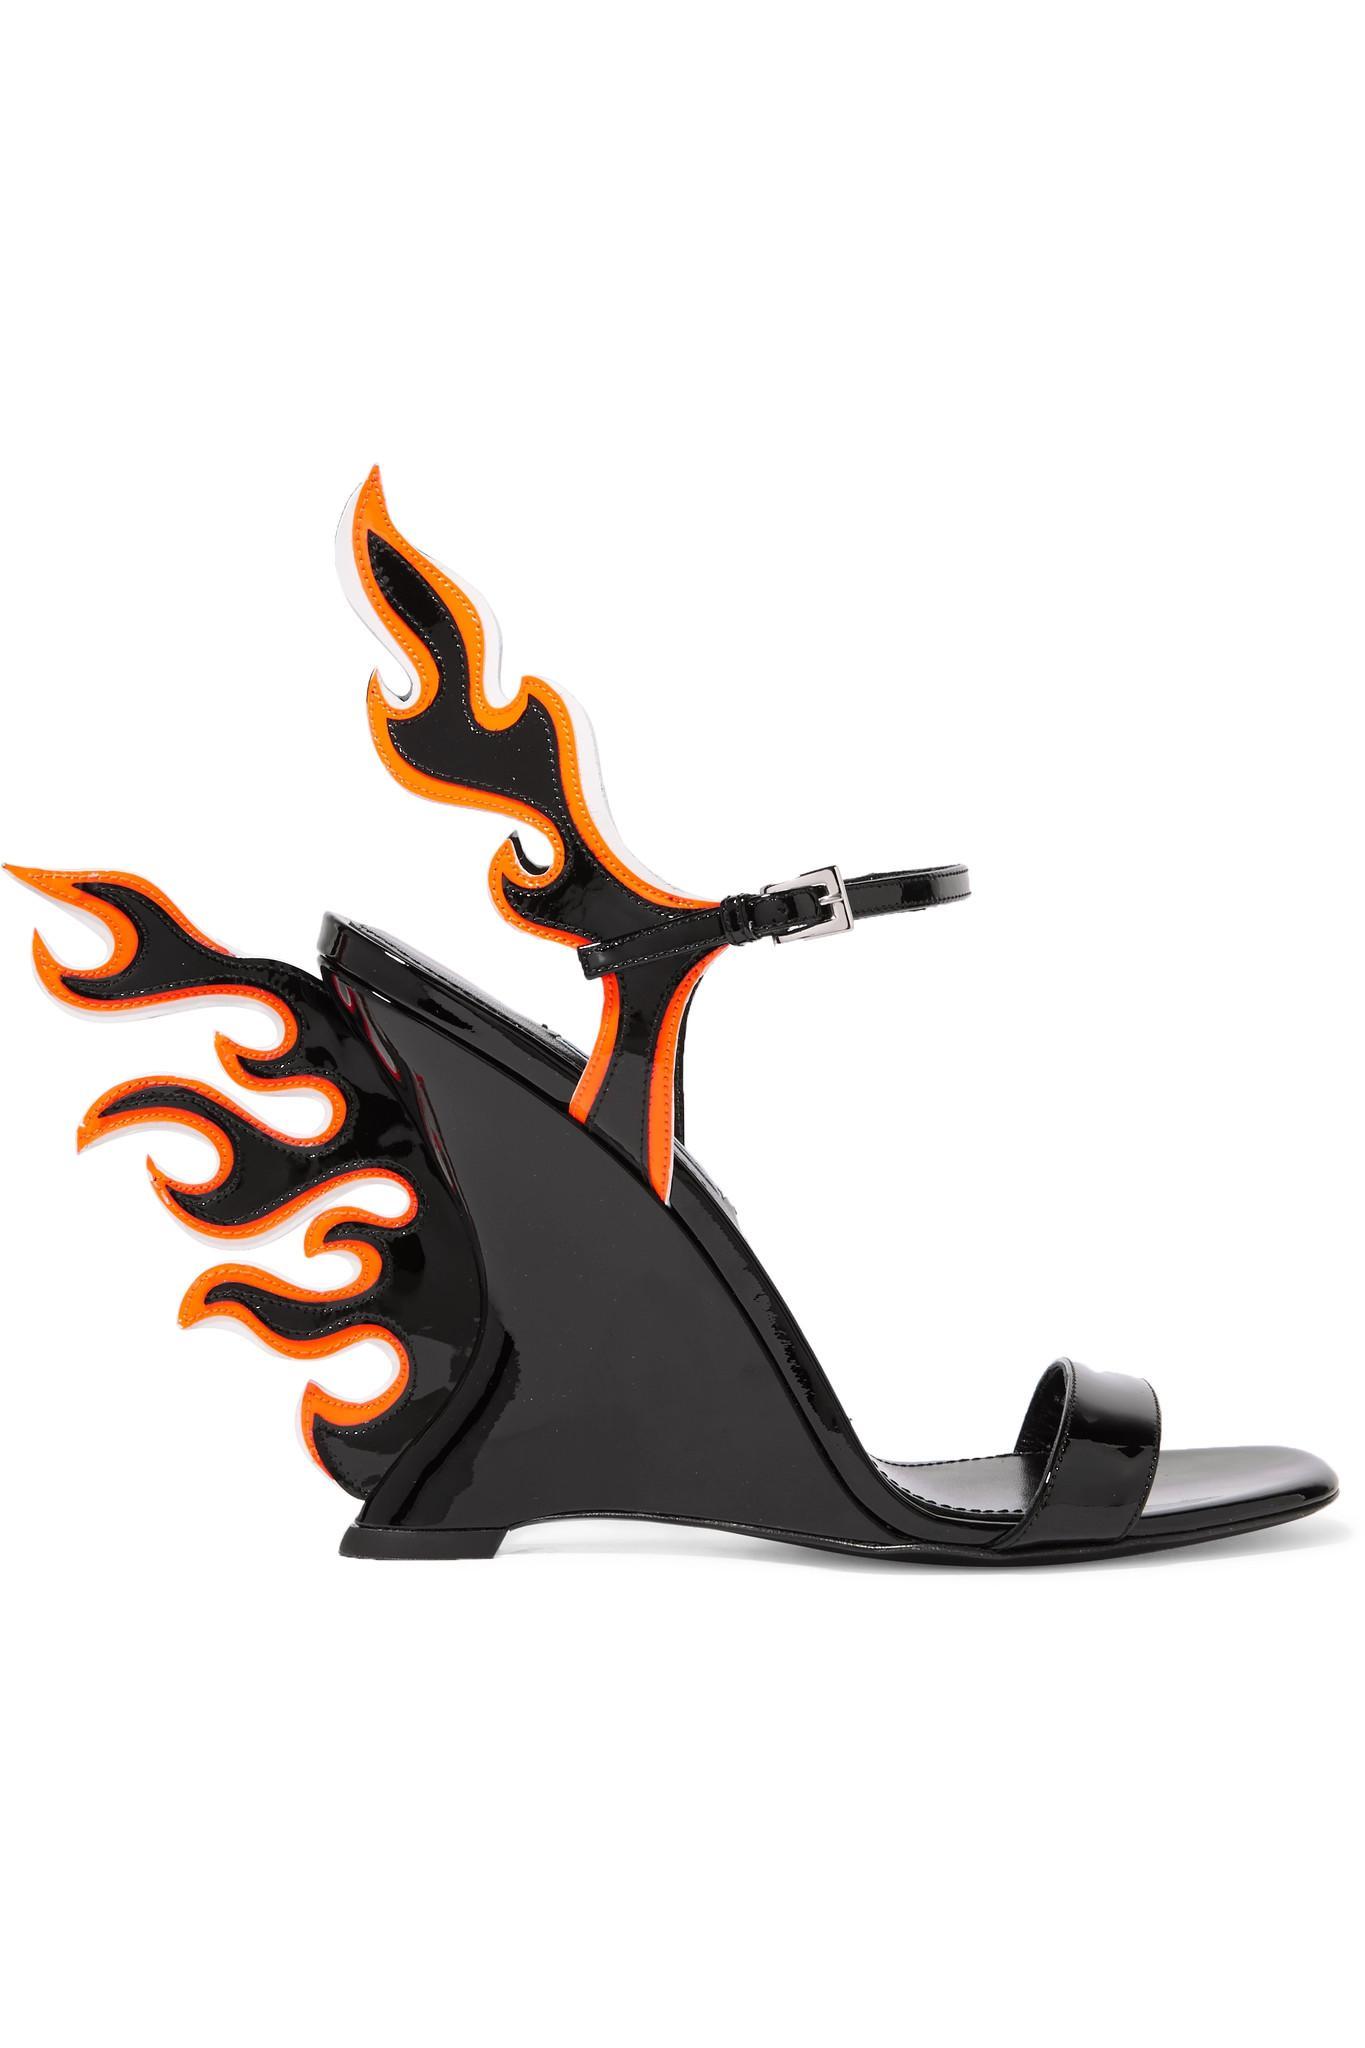 237994cf21cf Prada Patent-leather Wedge Sandals in Black - Lyst